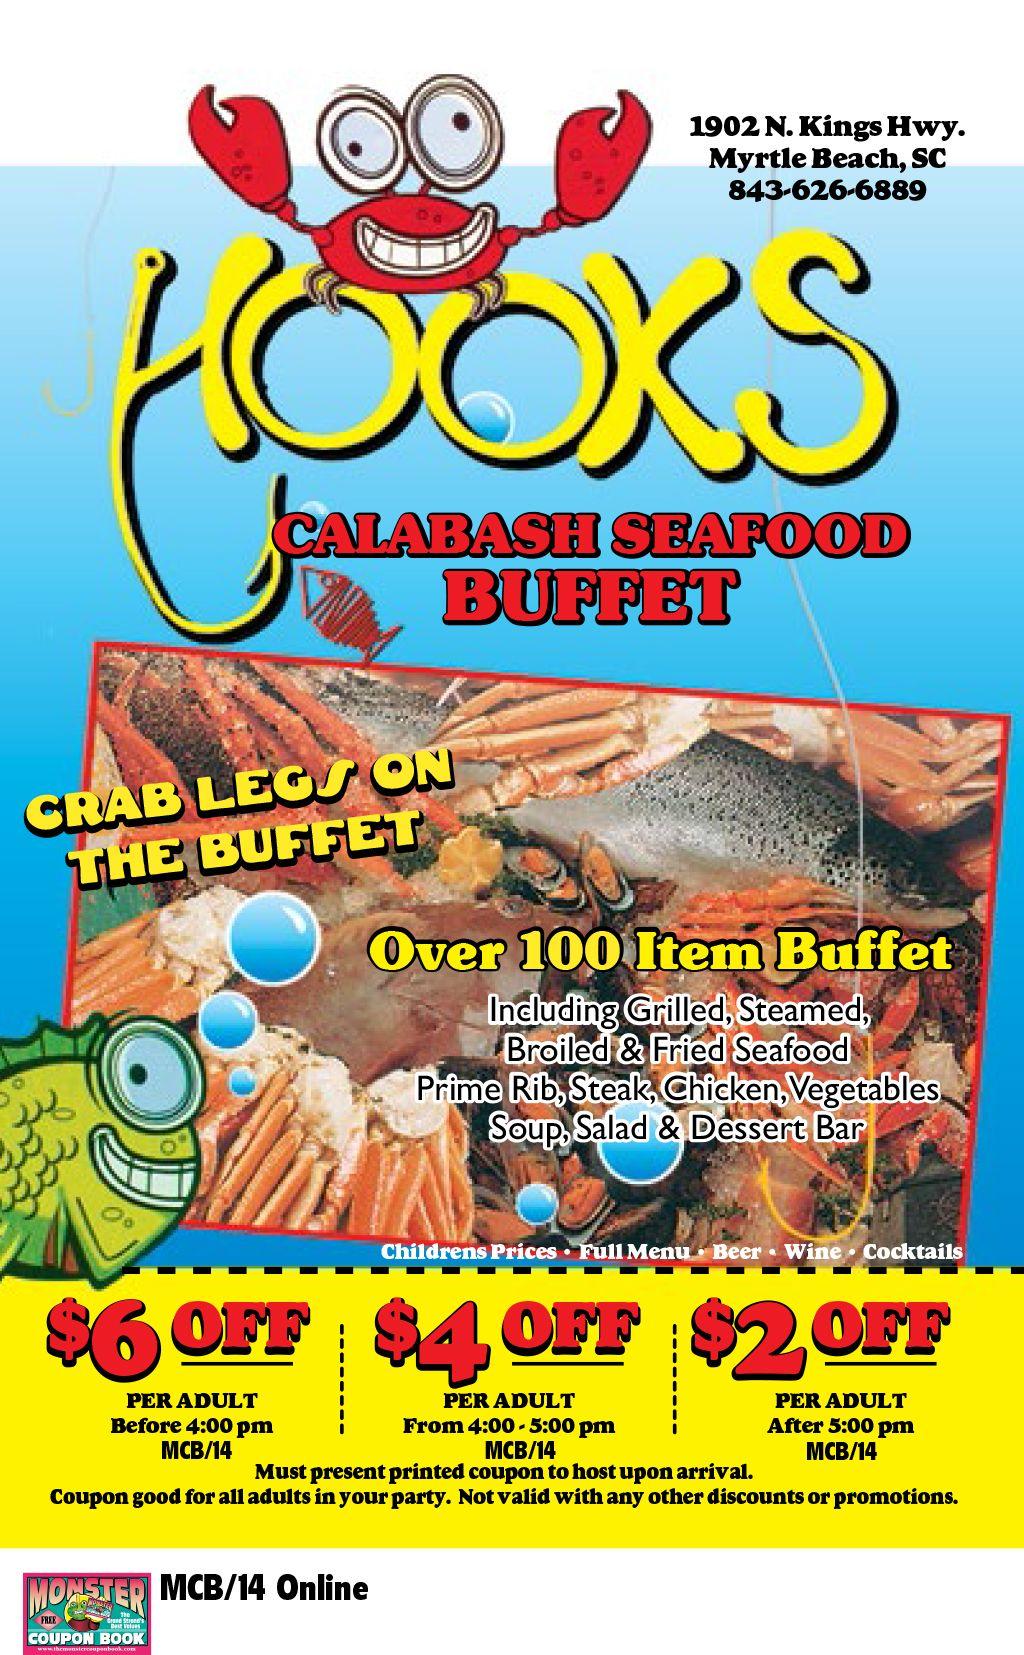 Hooks Calabash Seafood Buffet Myrtle Beach Resorts Calabash Seafood Seafood Buffet Myrtle Beach Resorts